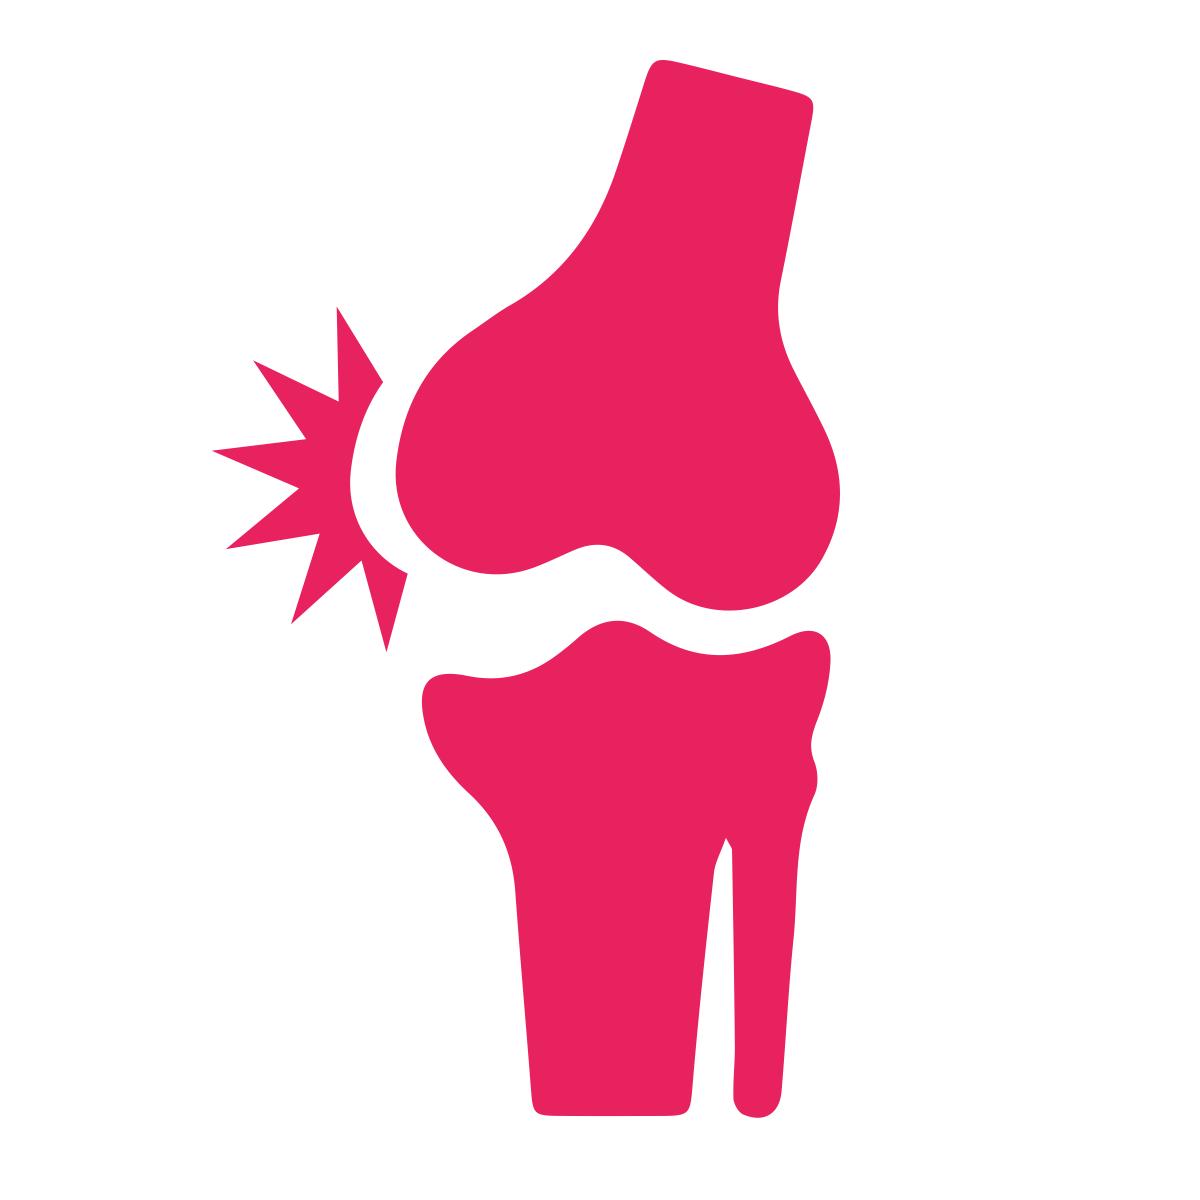 Proxima CRO orthopedic and spine